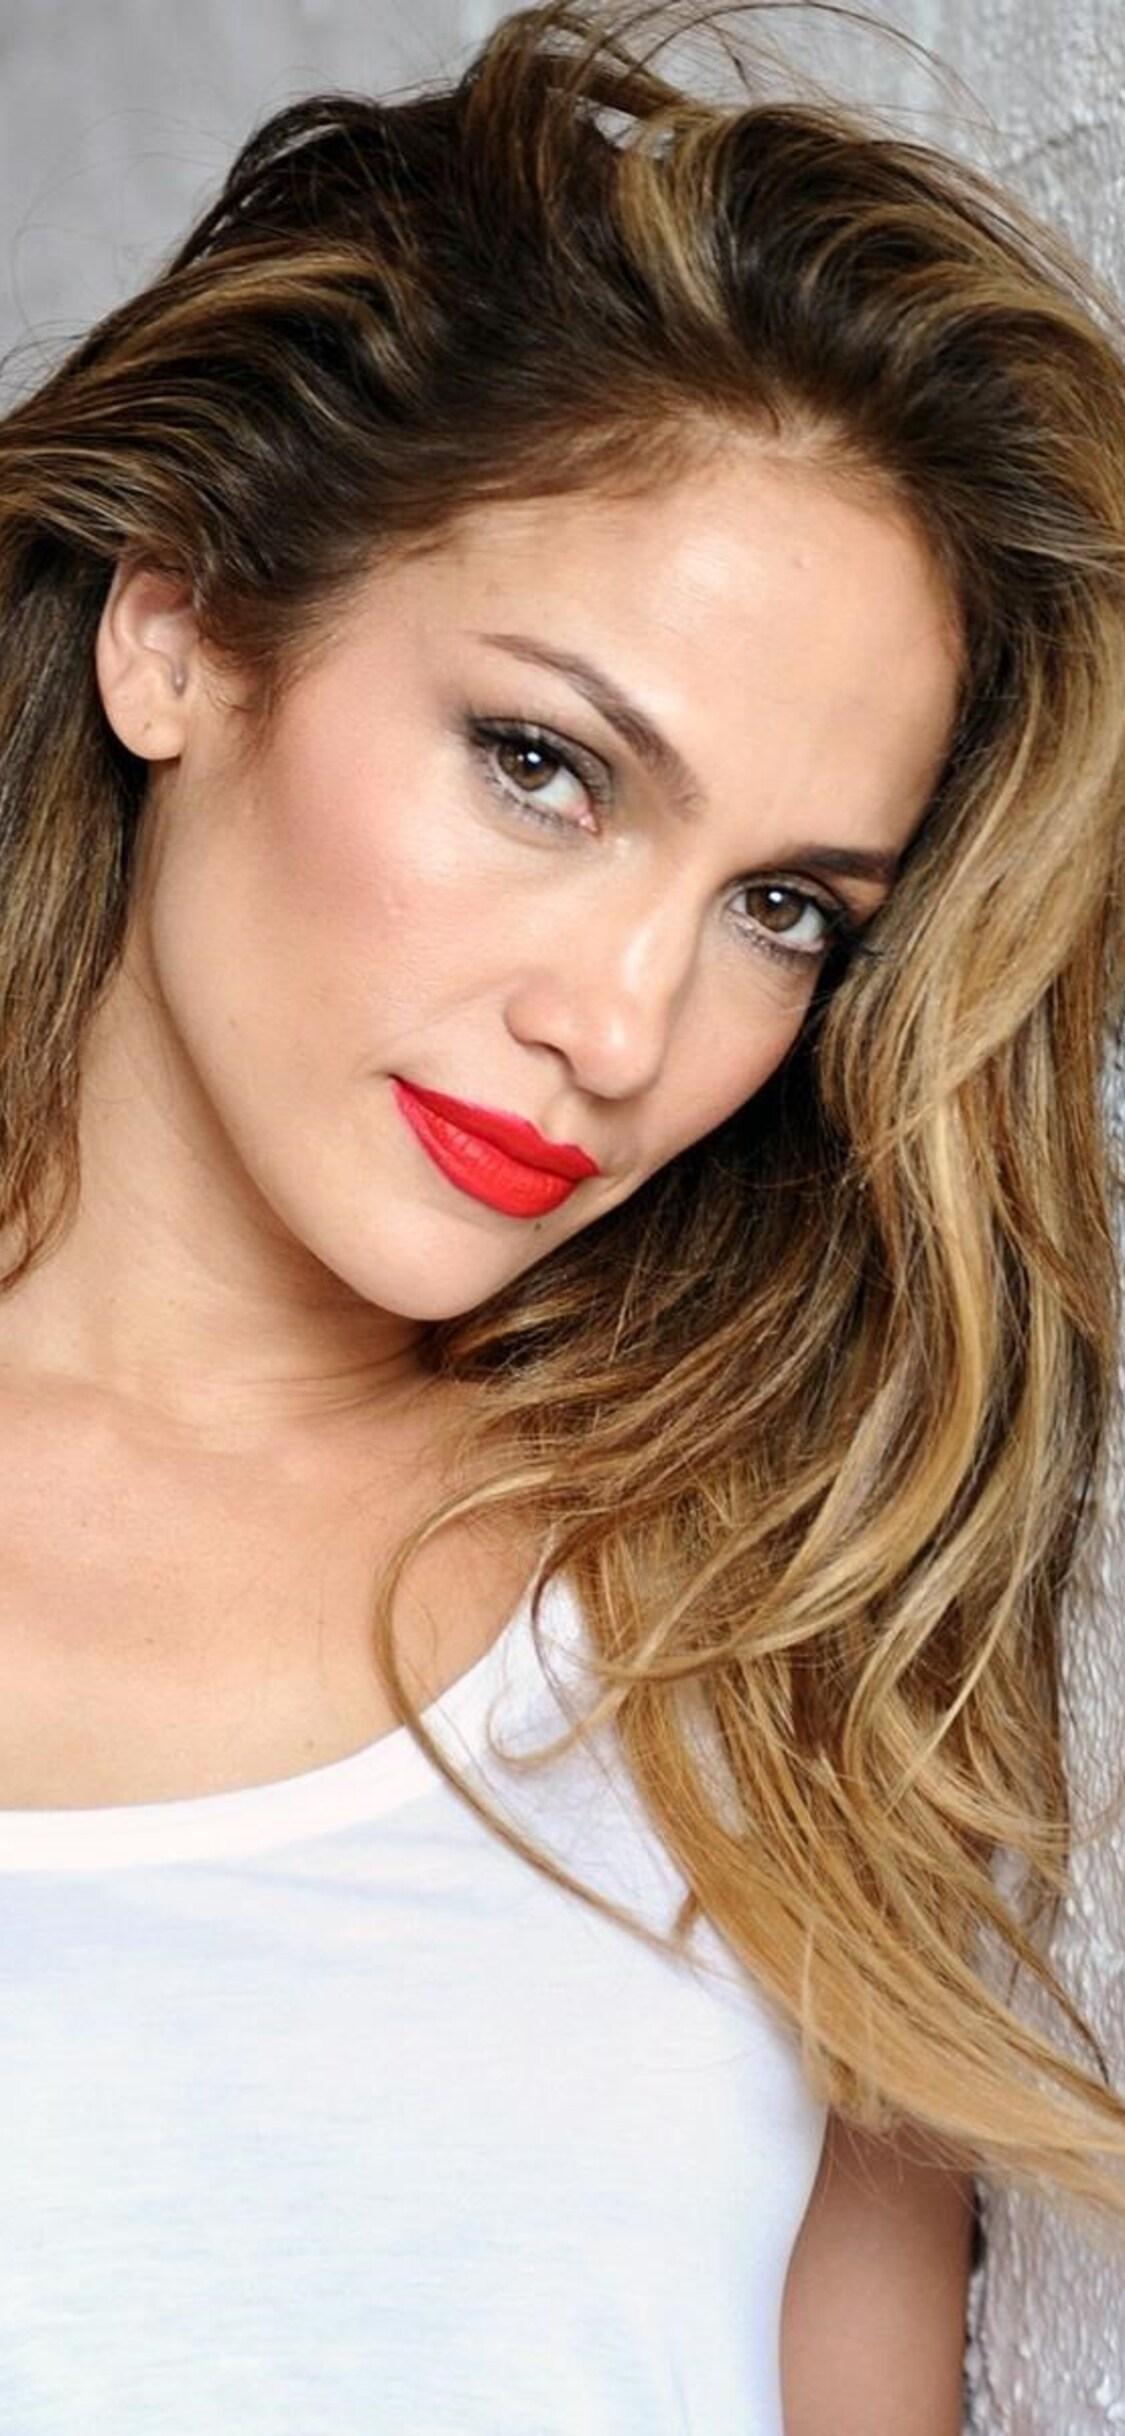 1125x2436 Jennifer Lopez Singer Iphone XS,Iphone 10,Iphone X